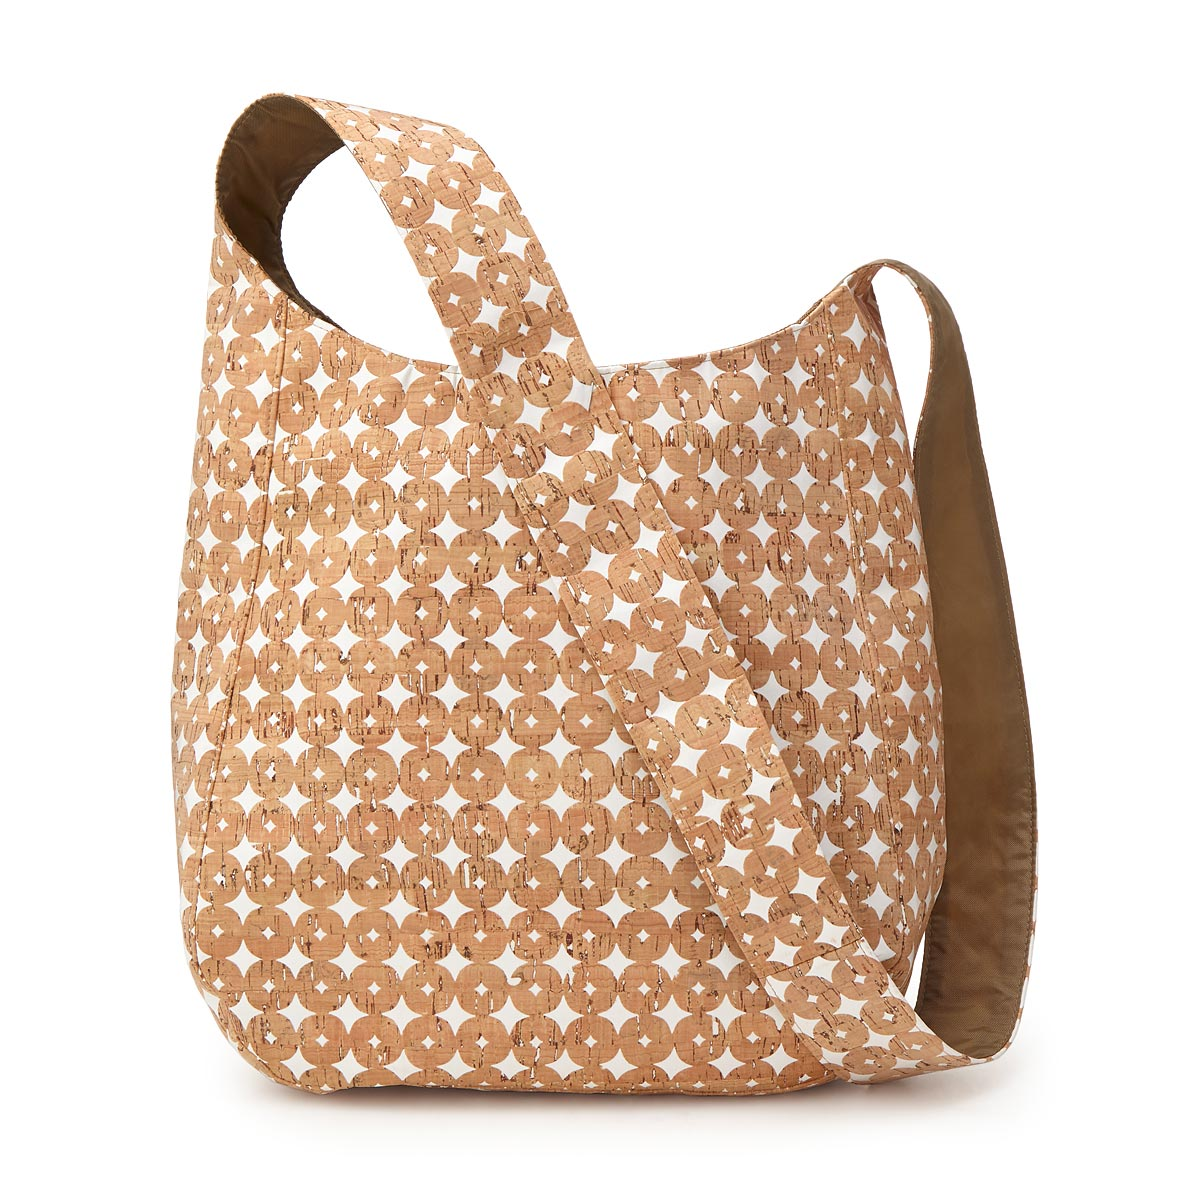 Cork Handbags: Cork Tote Bag, Sustainable Design